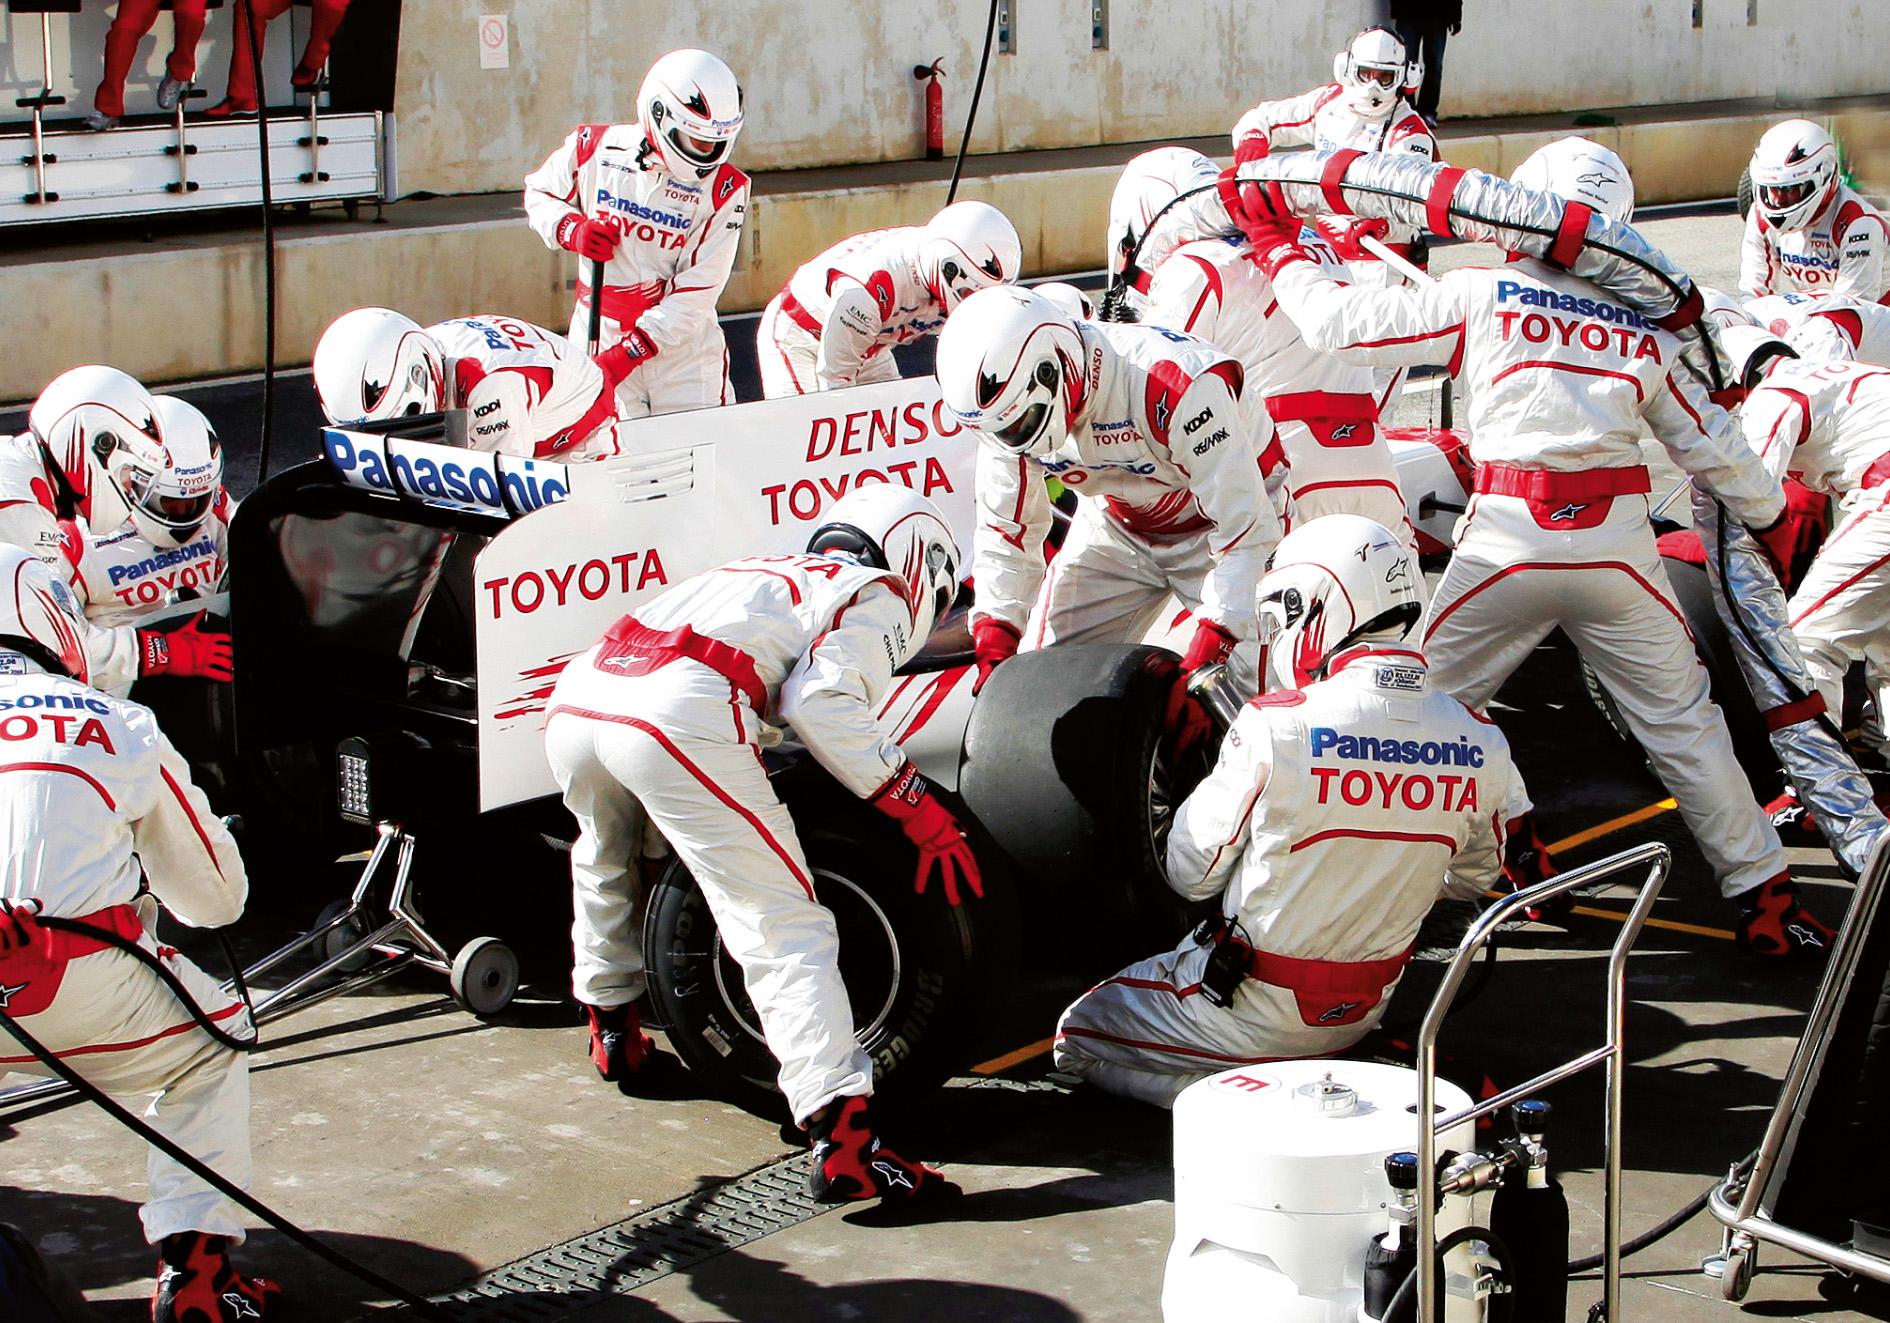 20_Josekdesign_Toyota_F1_Fotografie.jpg